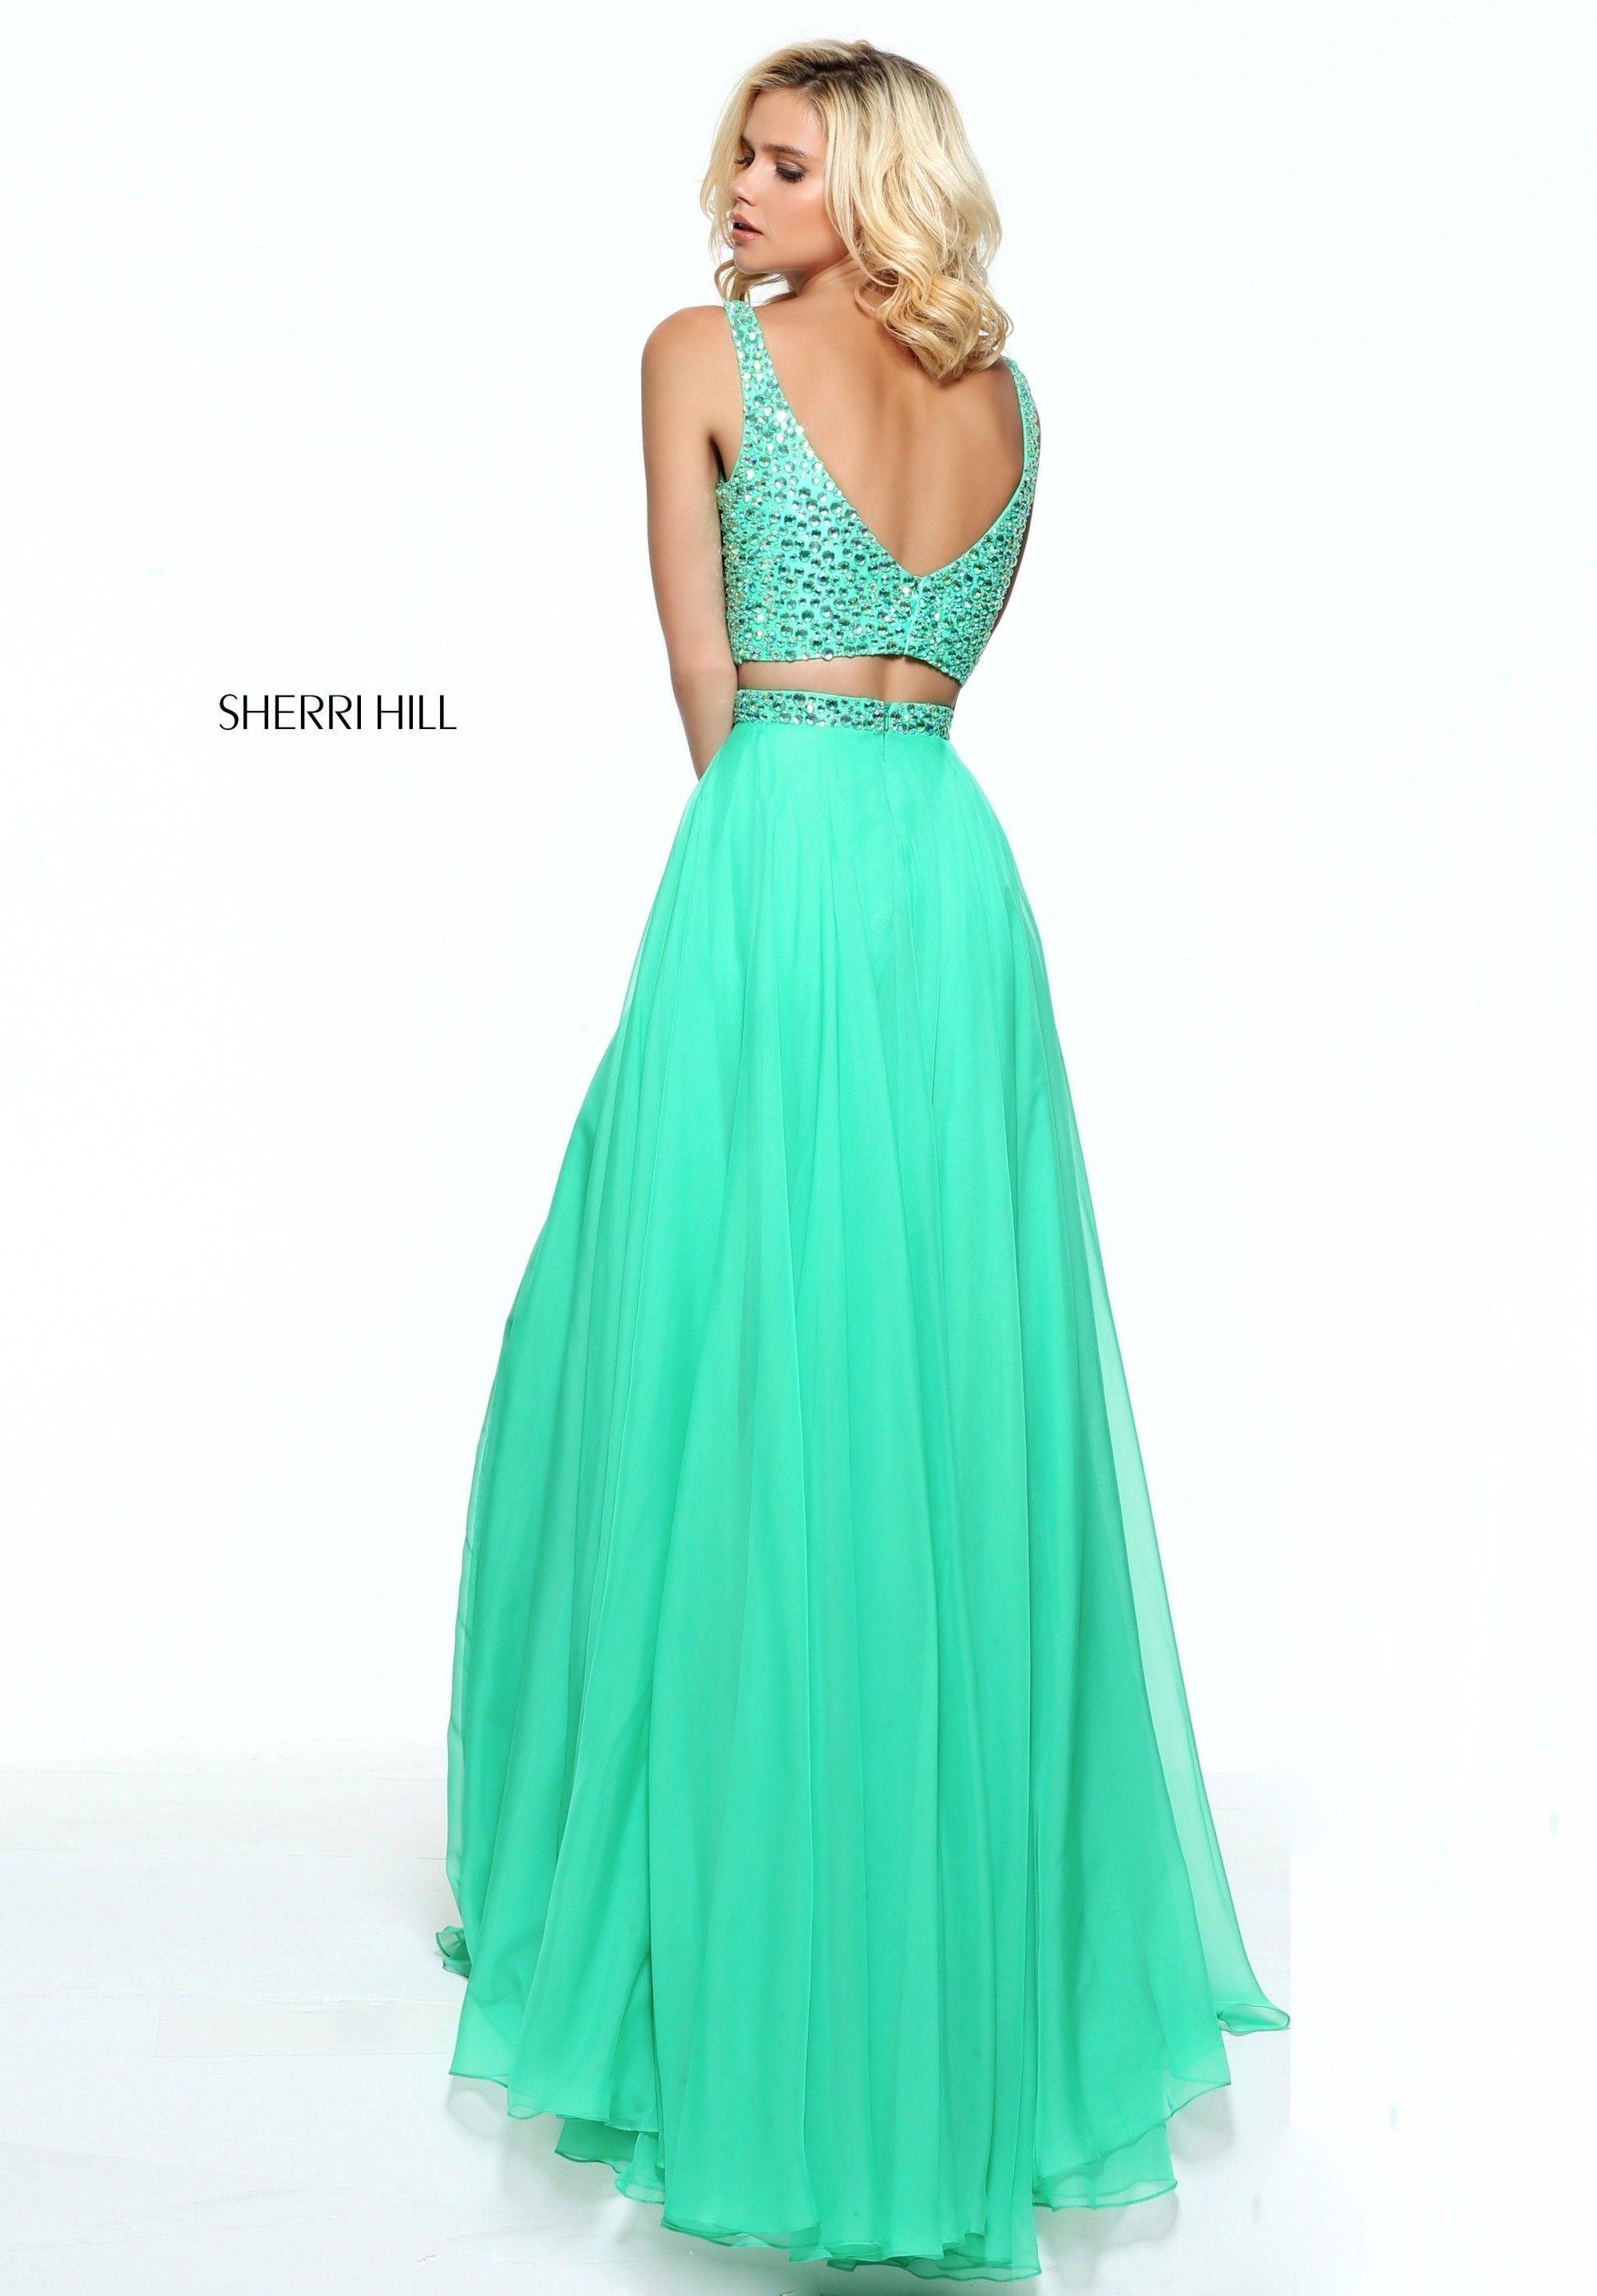 Sherri Hill 51008 Prom Dress   Pinterest   Sherri hill prom dresses ...